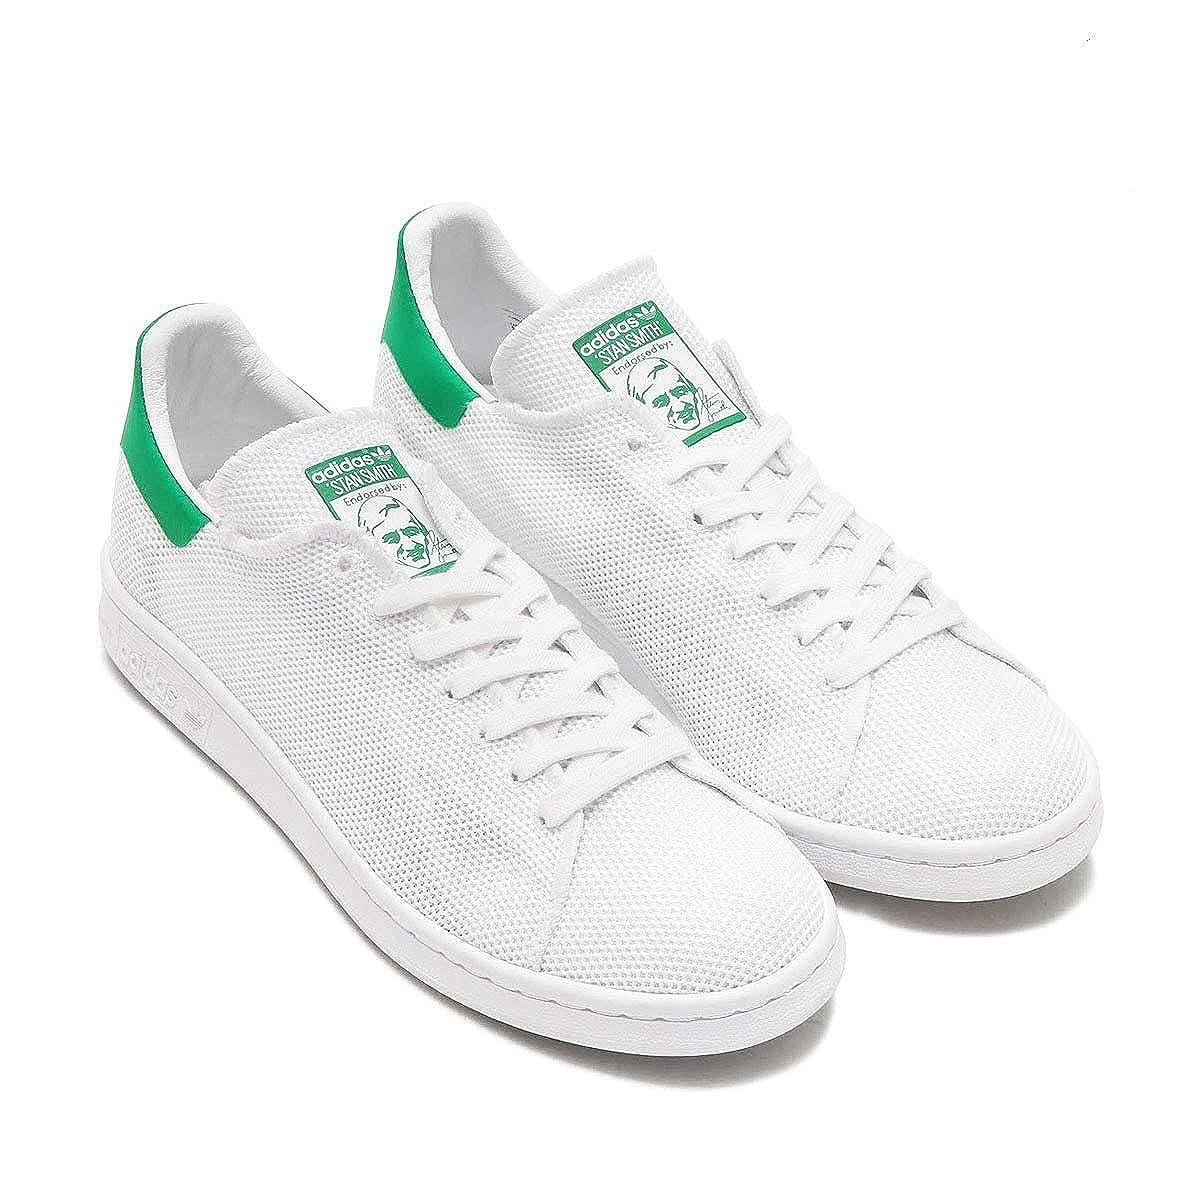 | adidas Originals Men's Stan Smith Sneakers